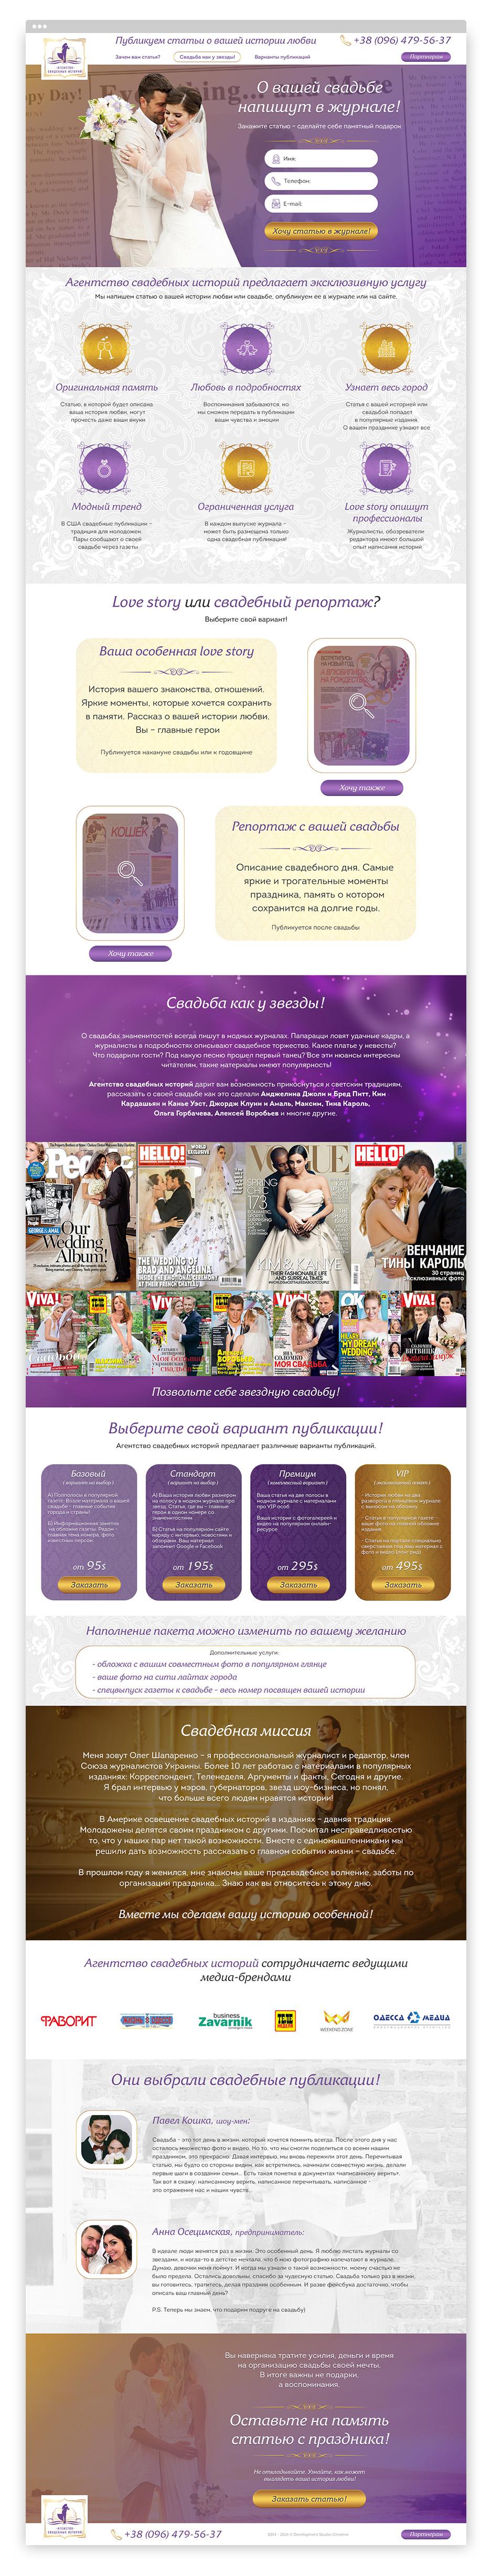 icreative-com-ua_wedding